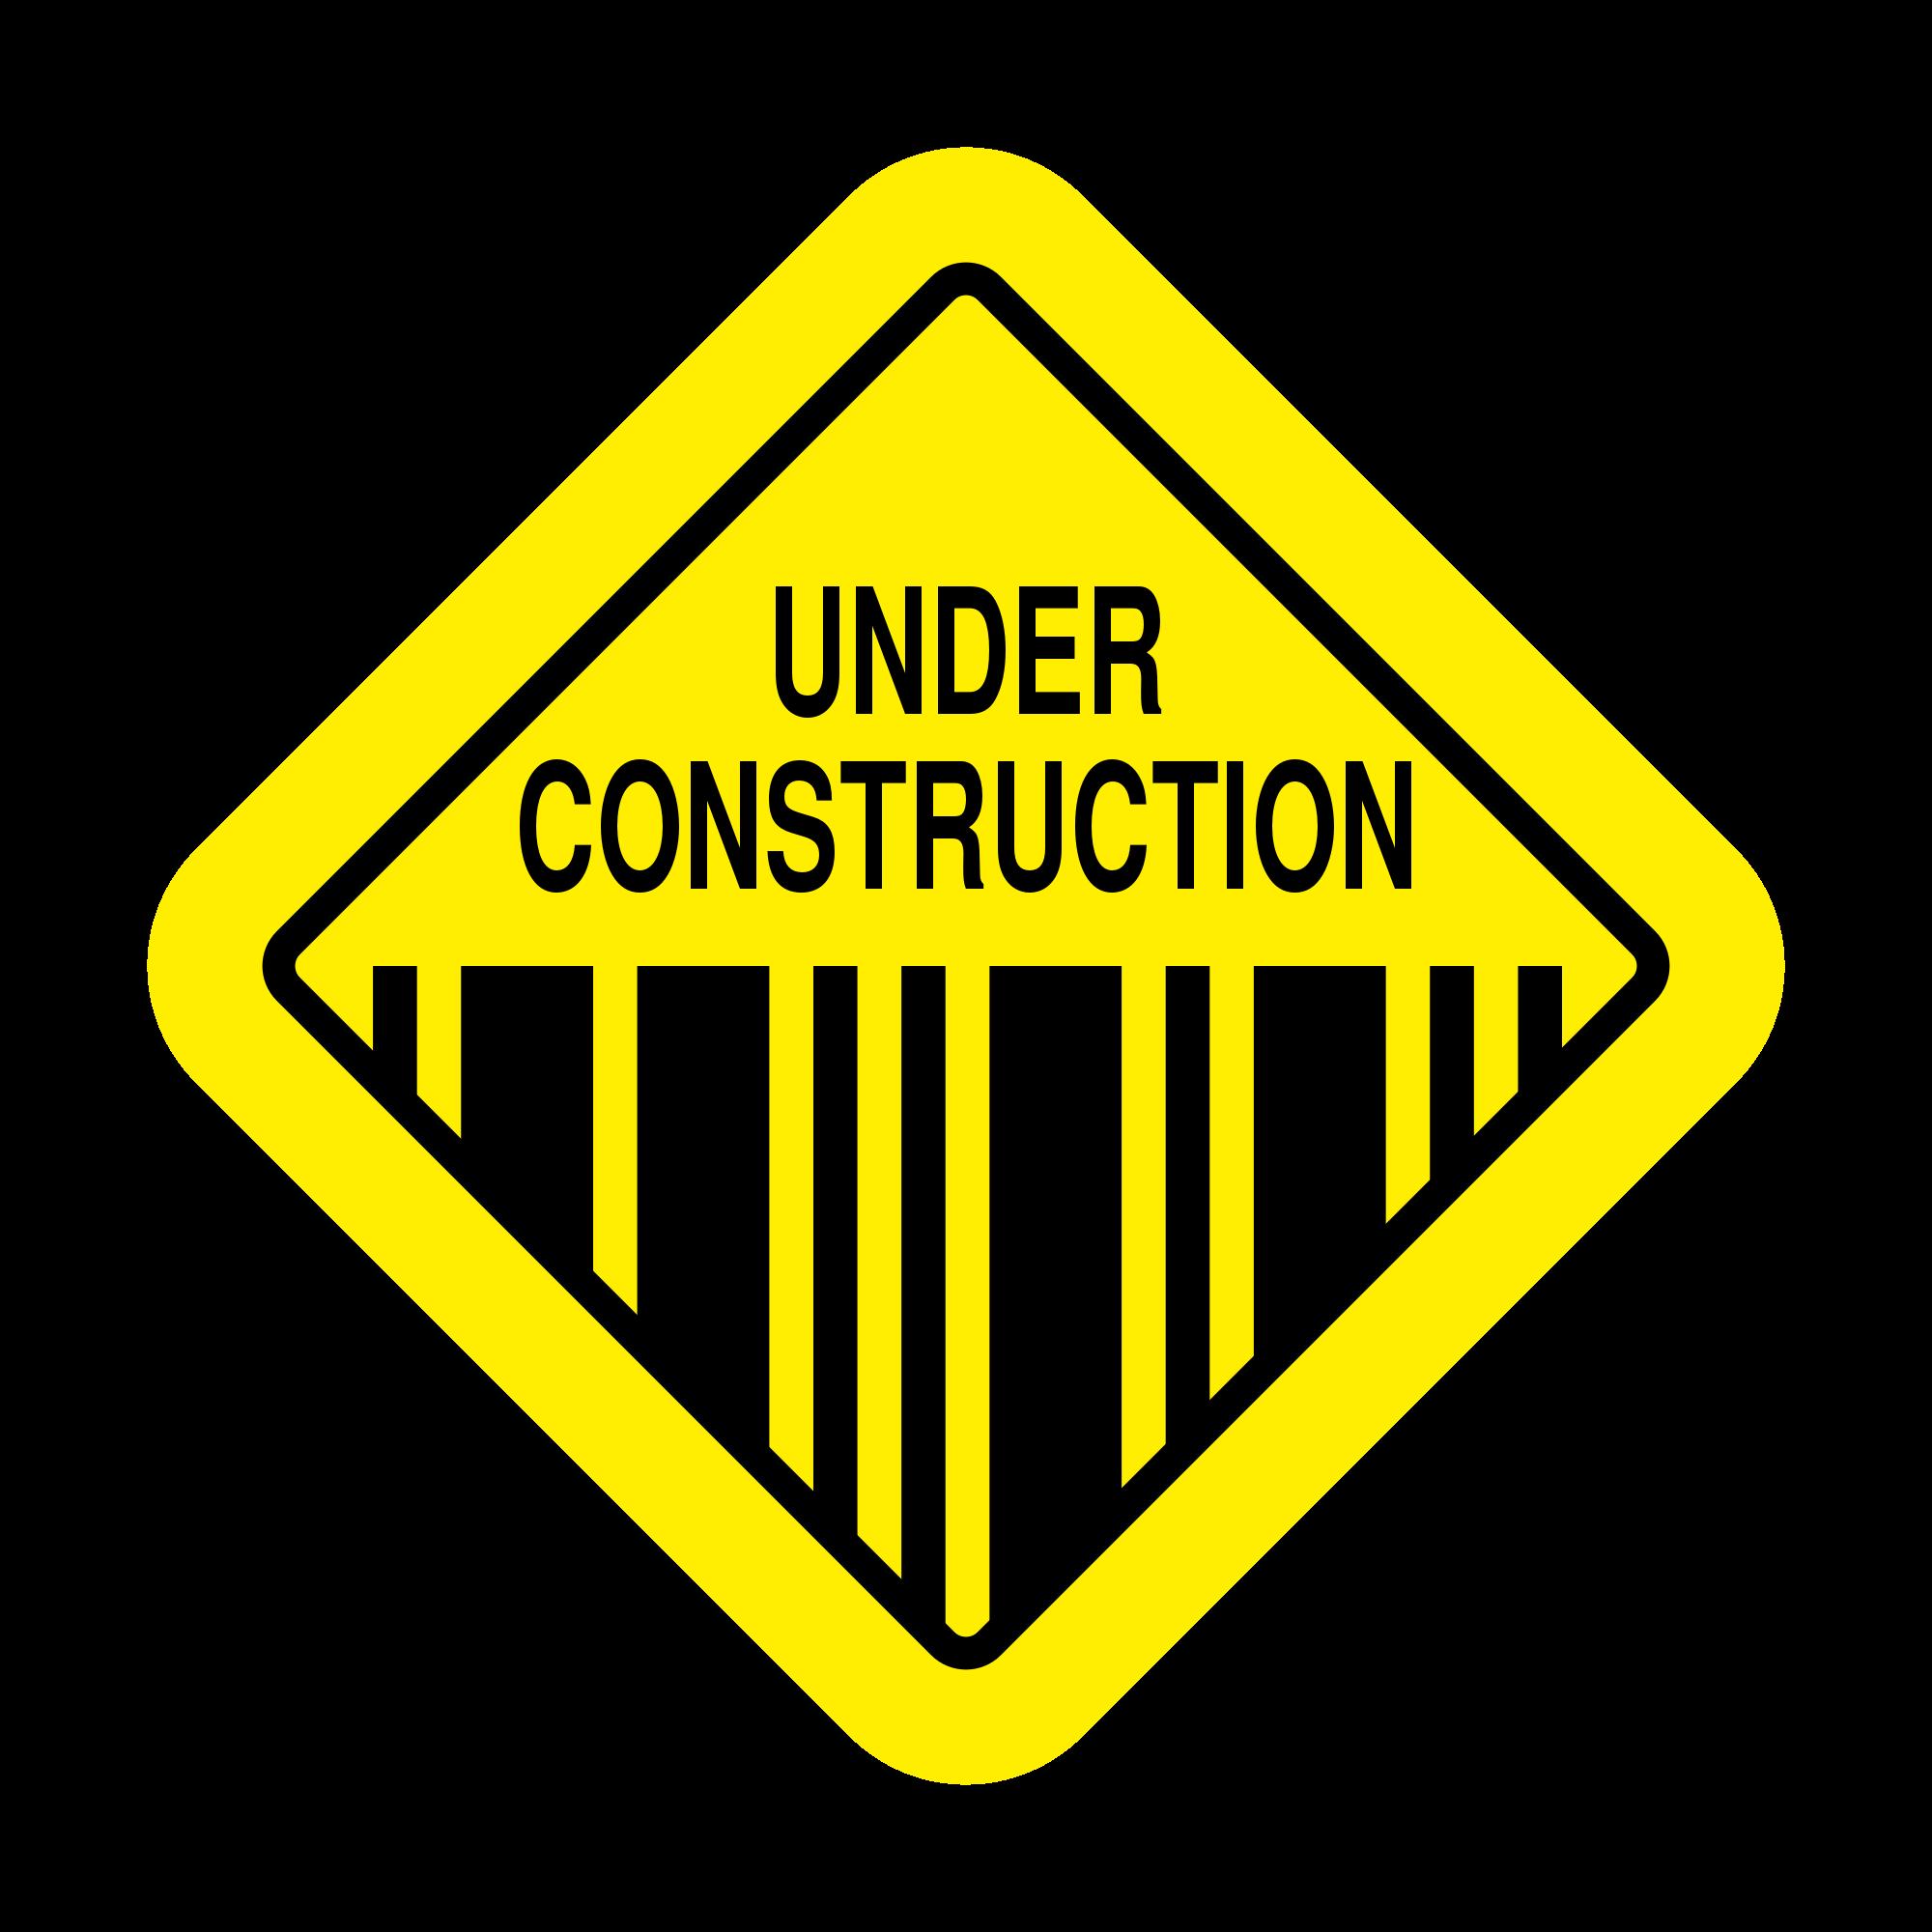 File wikidata logo under. Clipart diamond sign